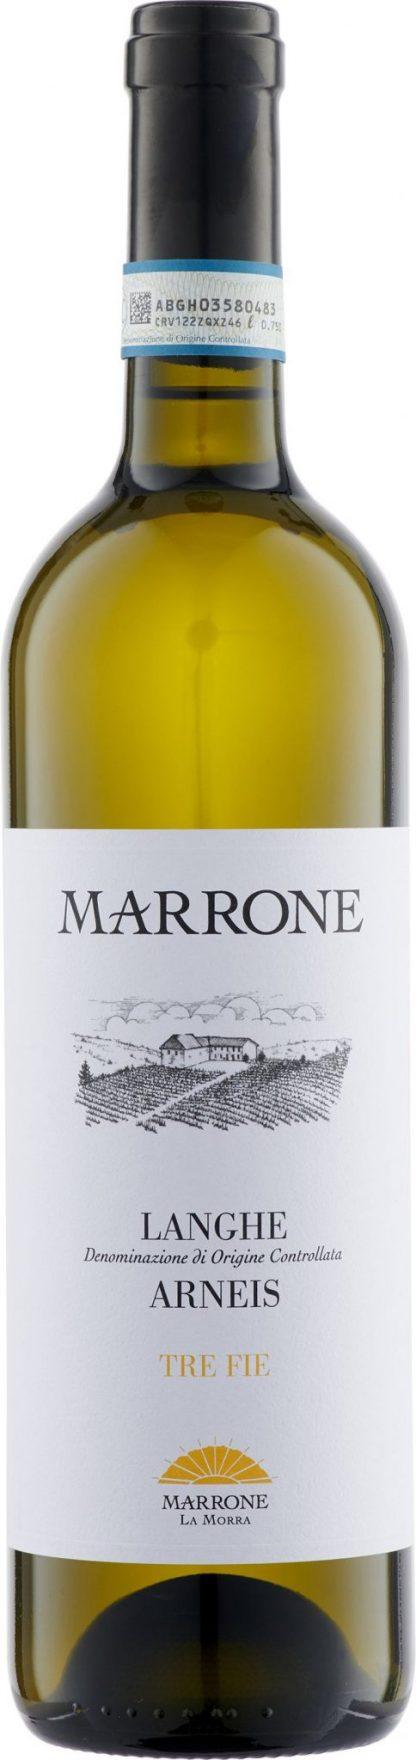 "Marrone - Langhe DOC Arneis ""Tre Fie"" 2018"